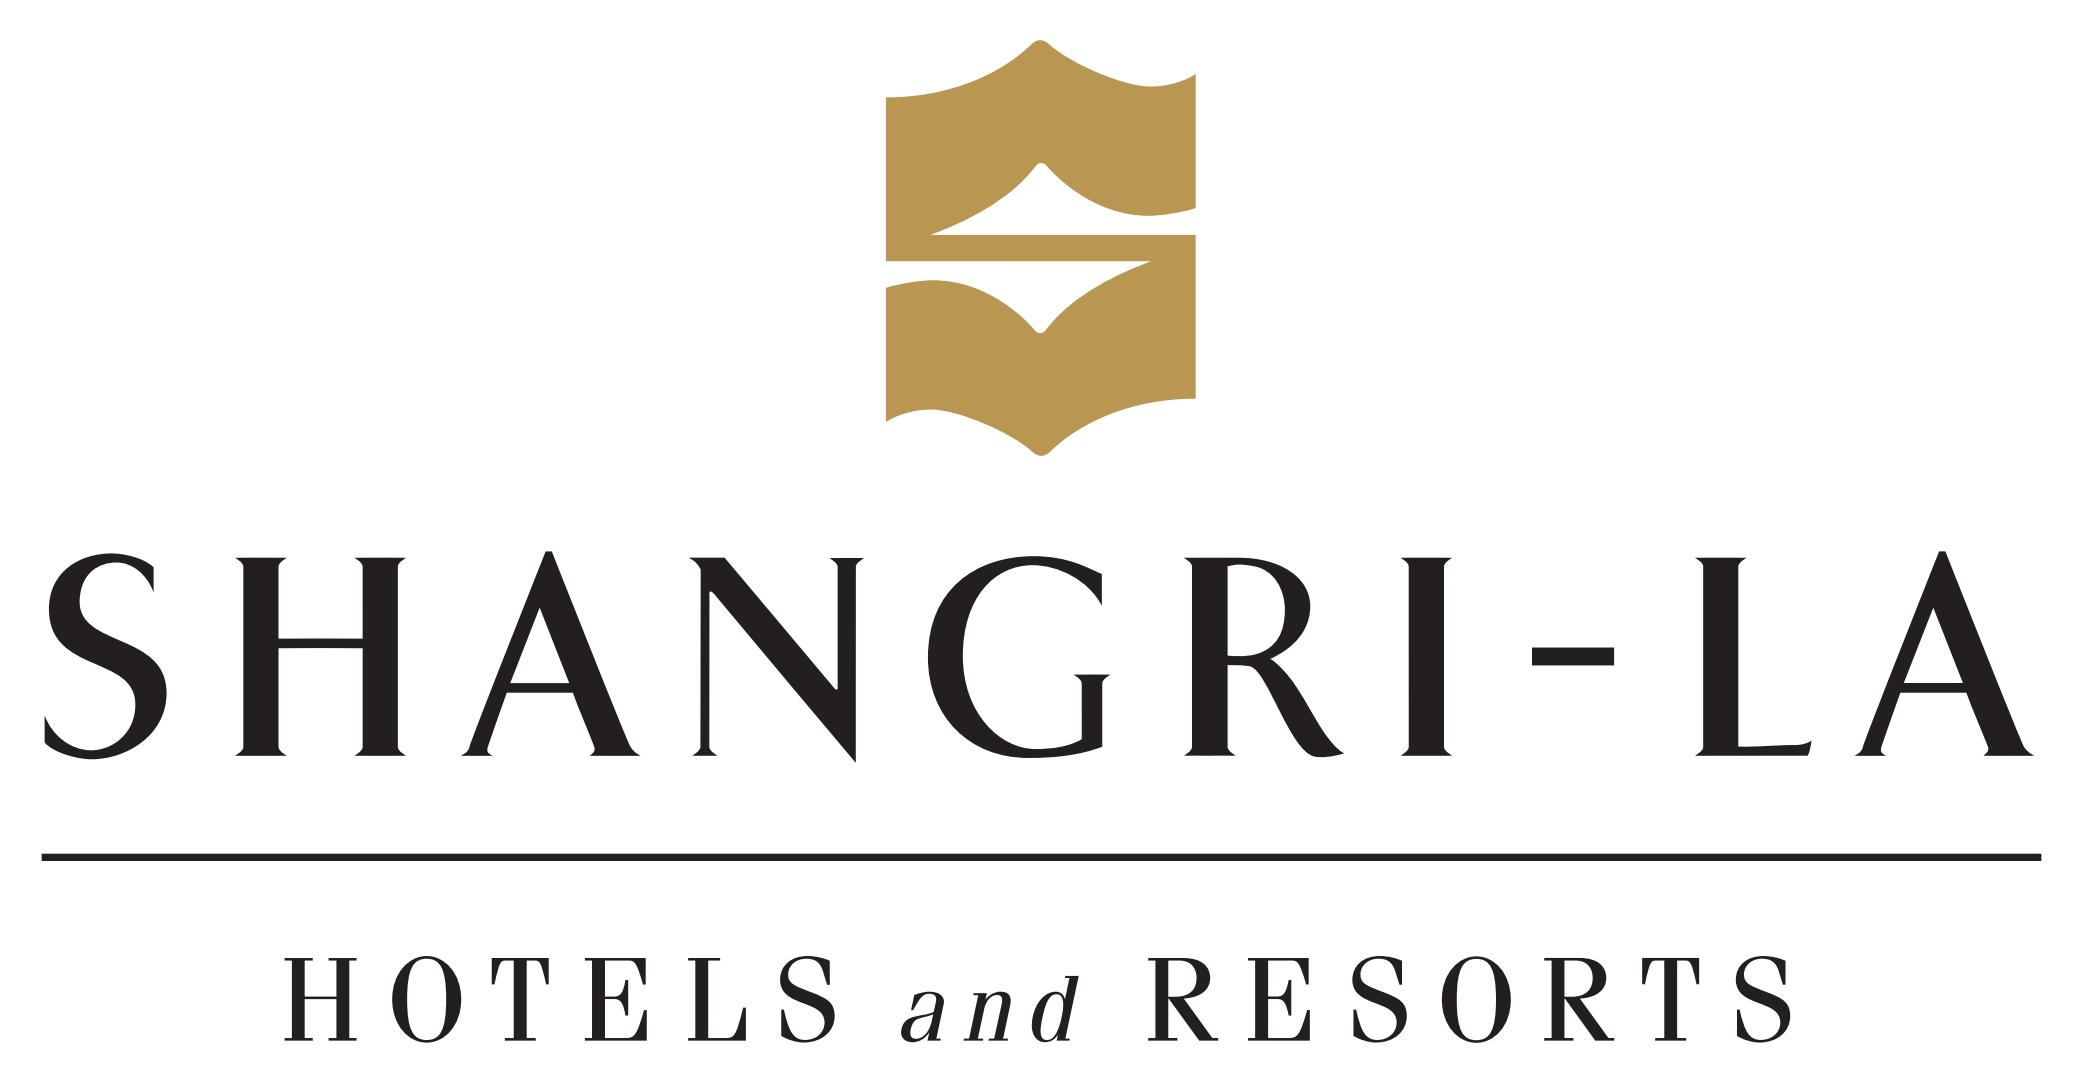 Shangri-la Hotels profile banner